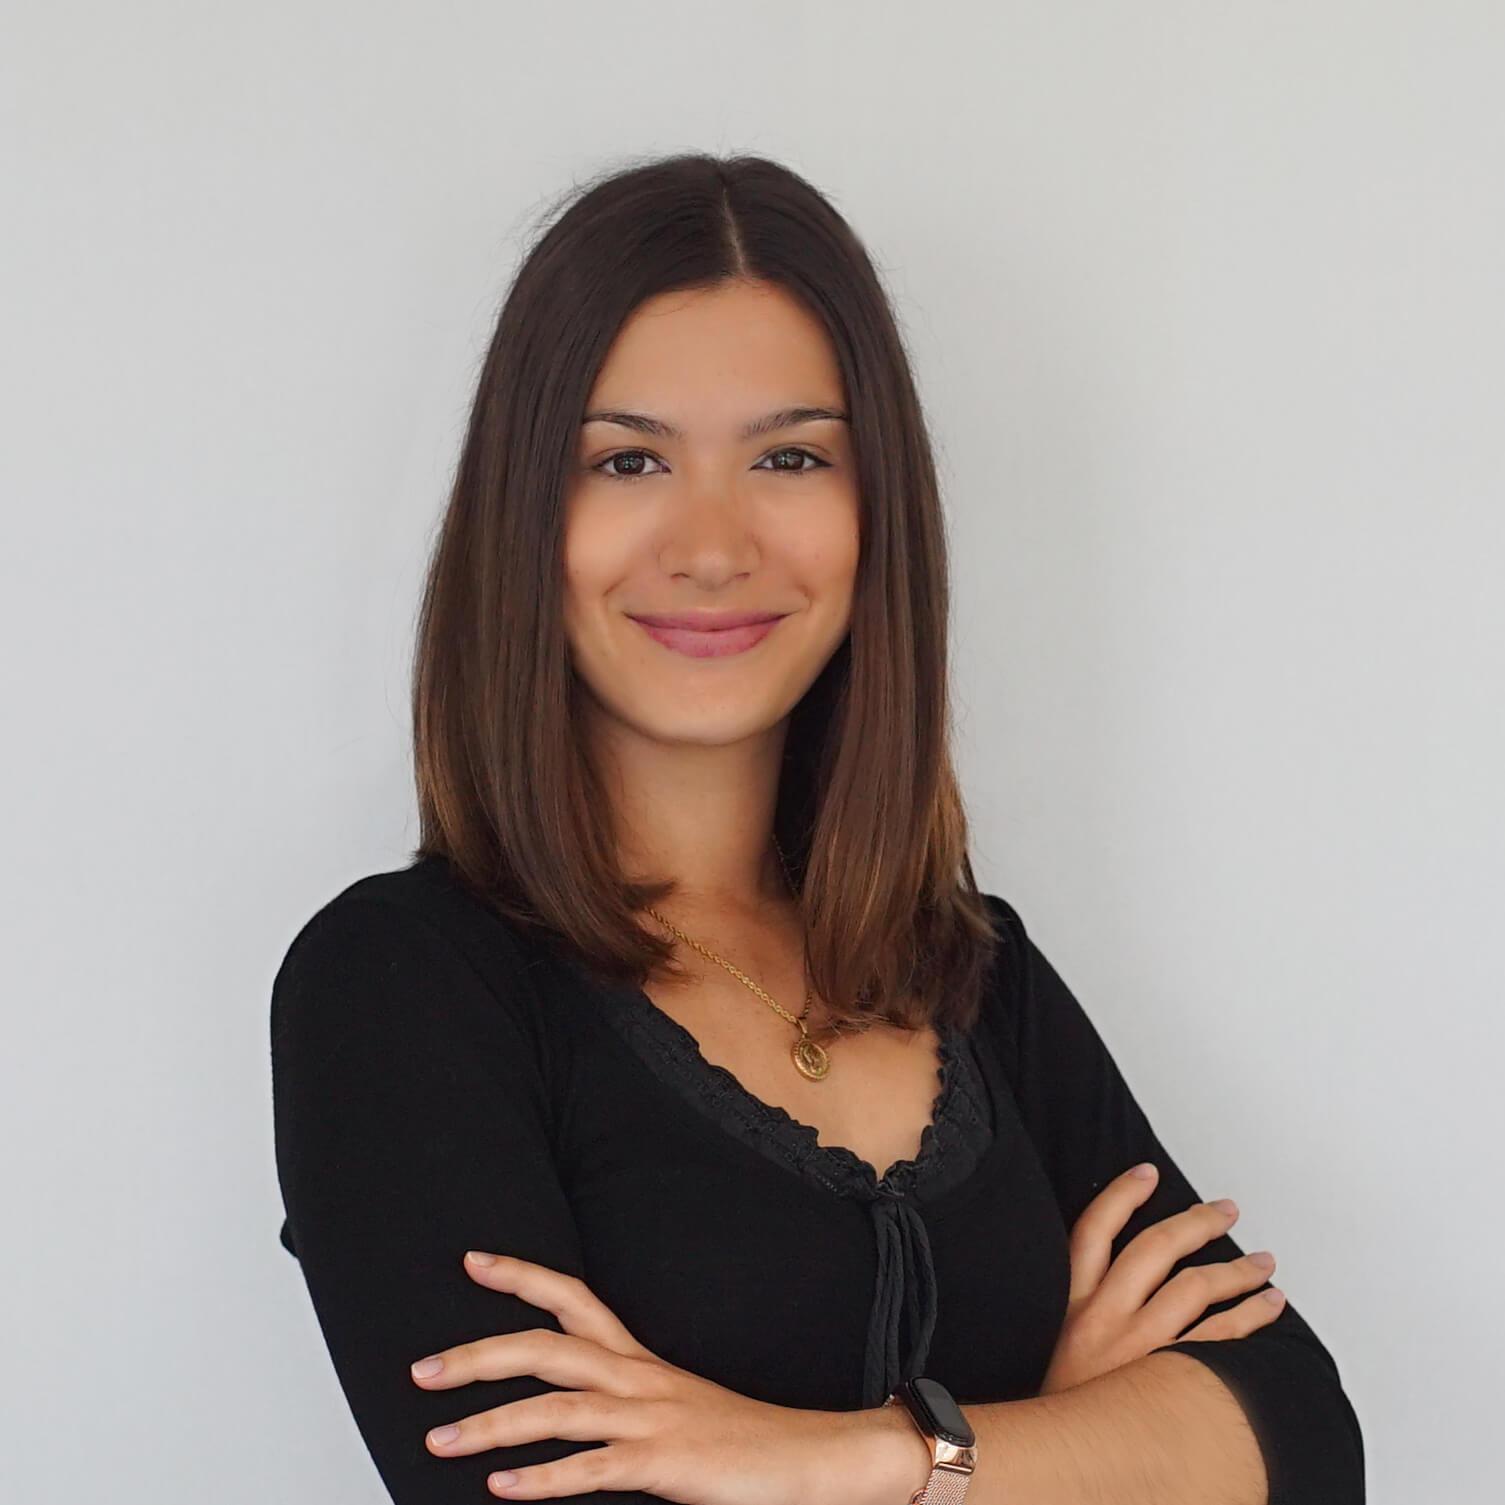 Rafaela Rolhas - Business Manager @ IT People Innovation